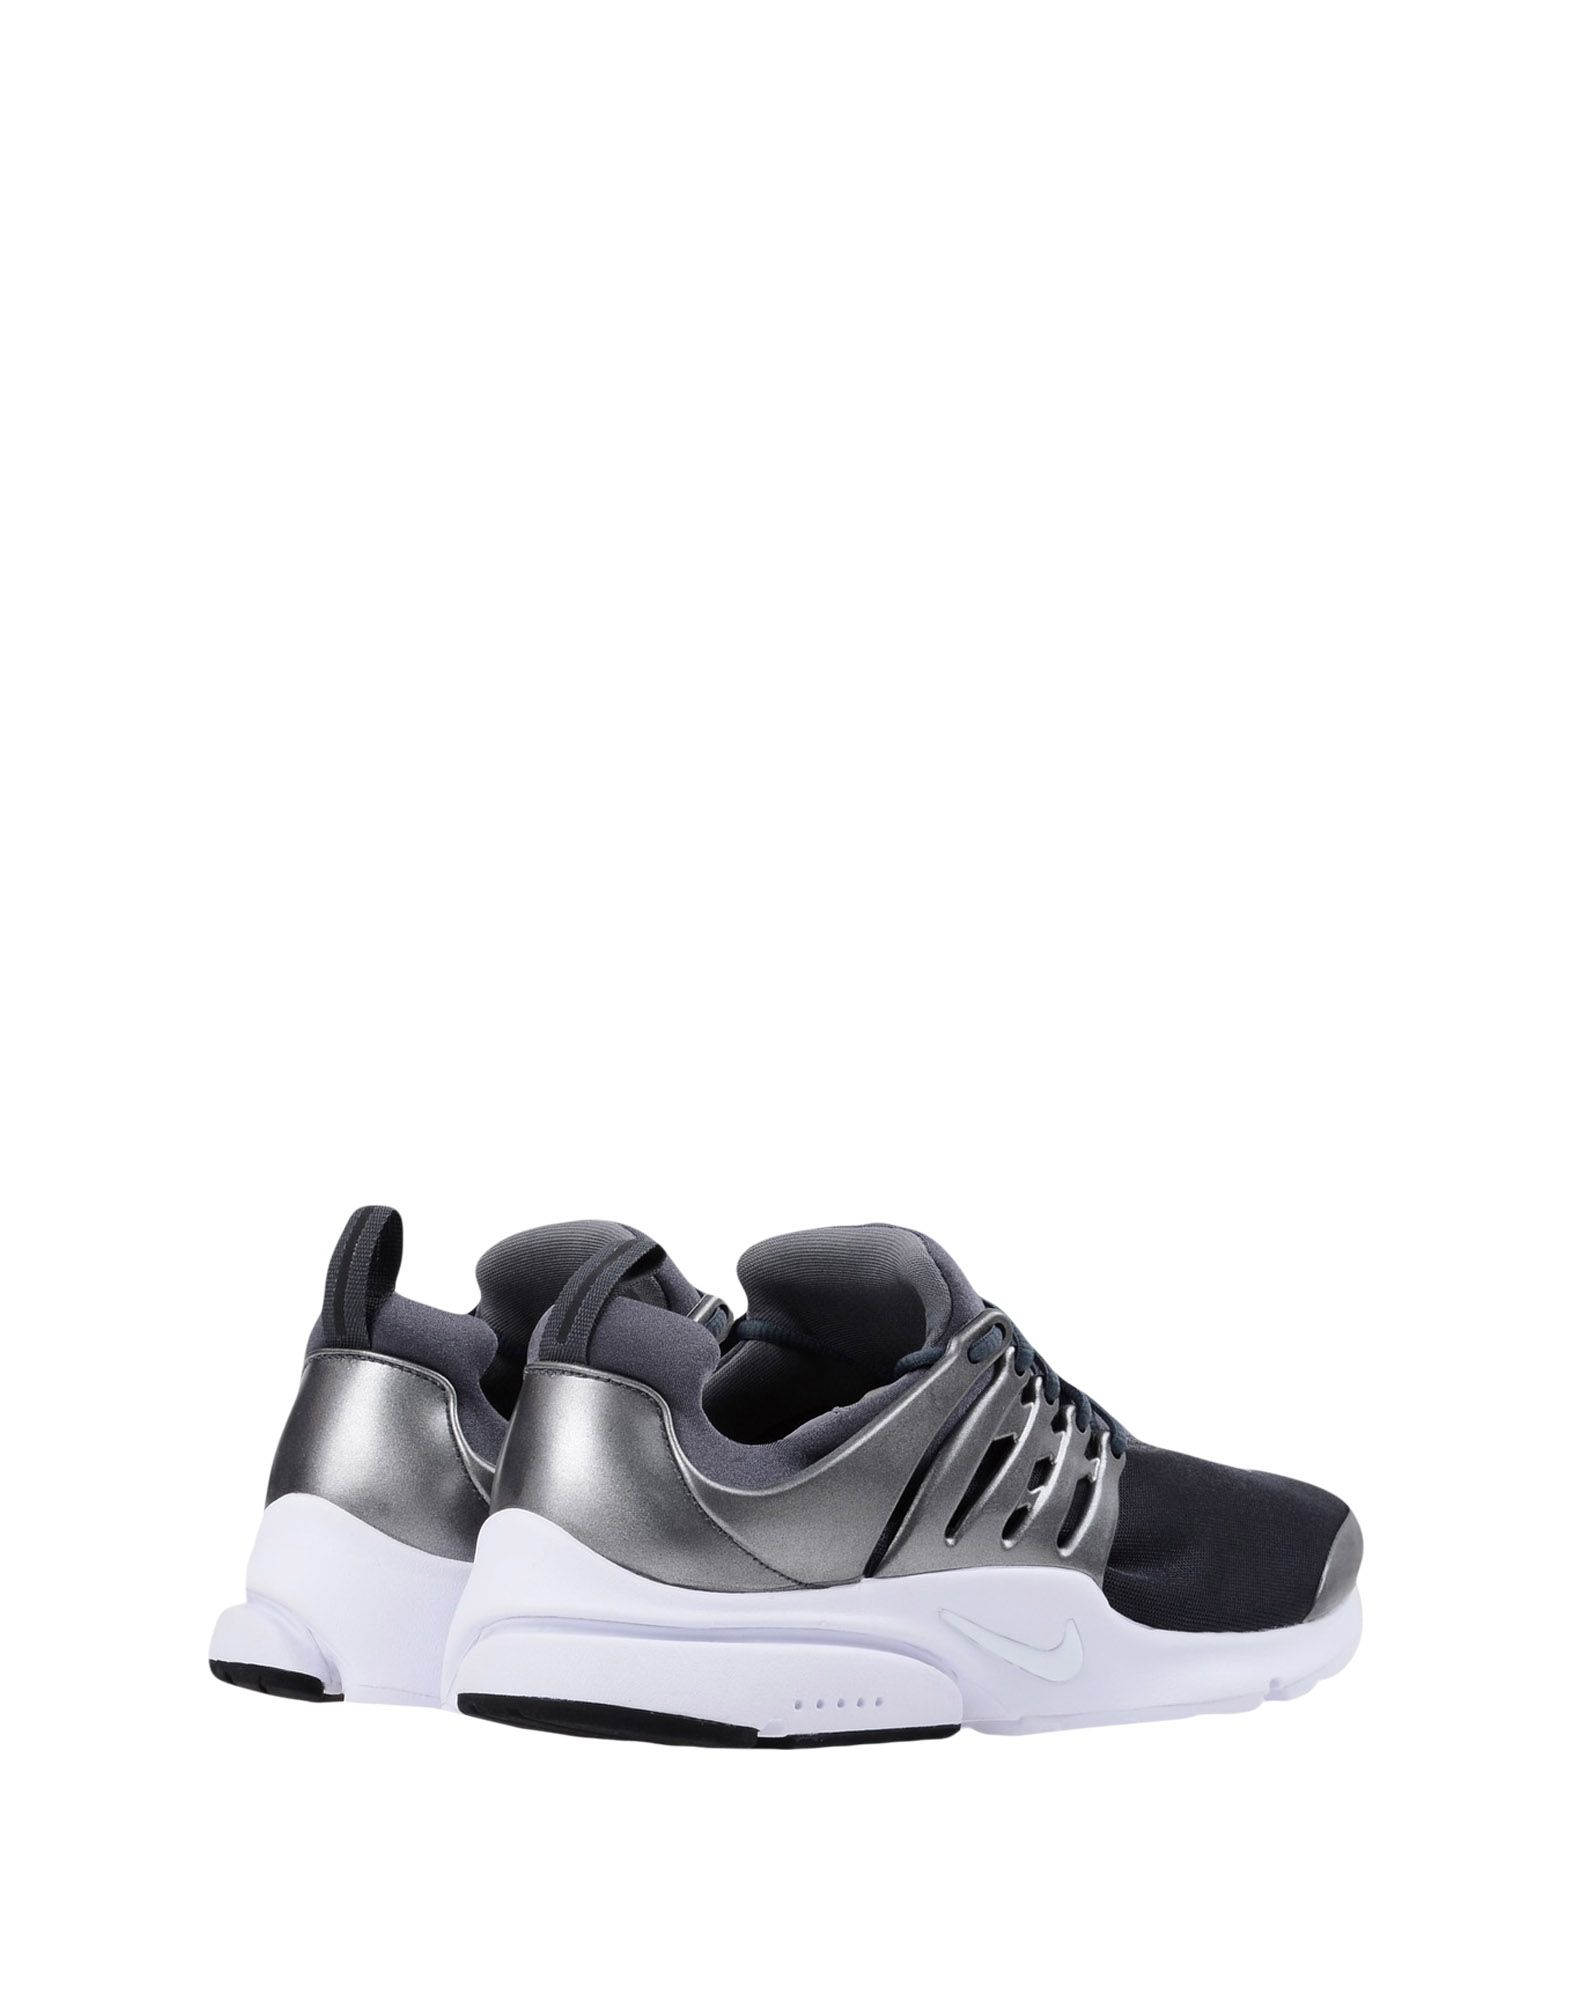 ... Rabatt echte Presto Schuhe Nike Air Presto echte Premium 11325504SU  f9256f ... 3eaeb35d64